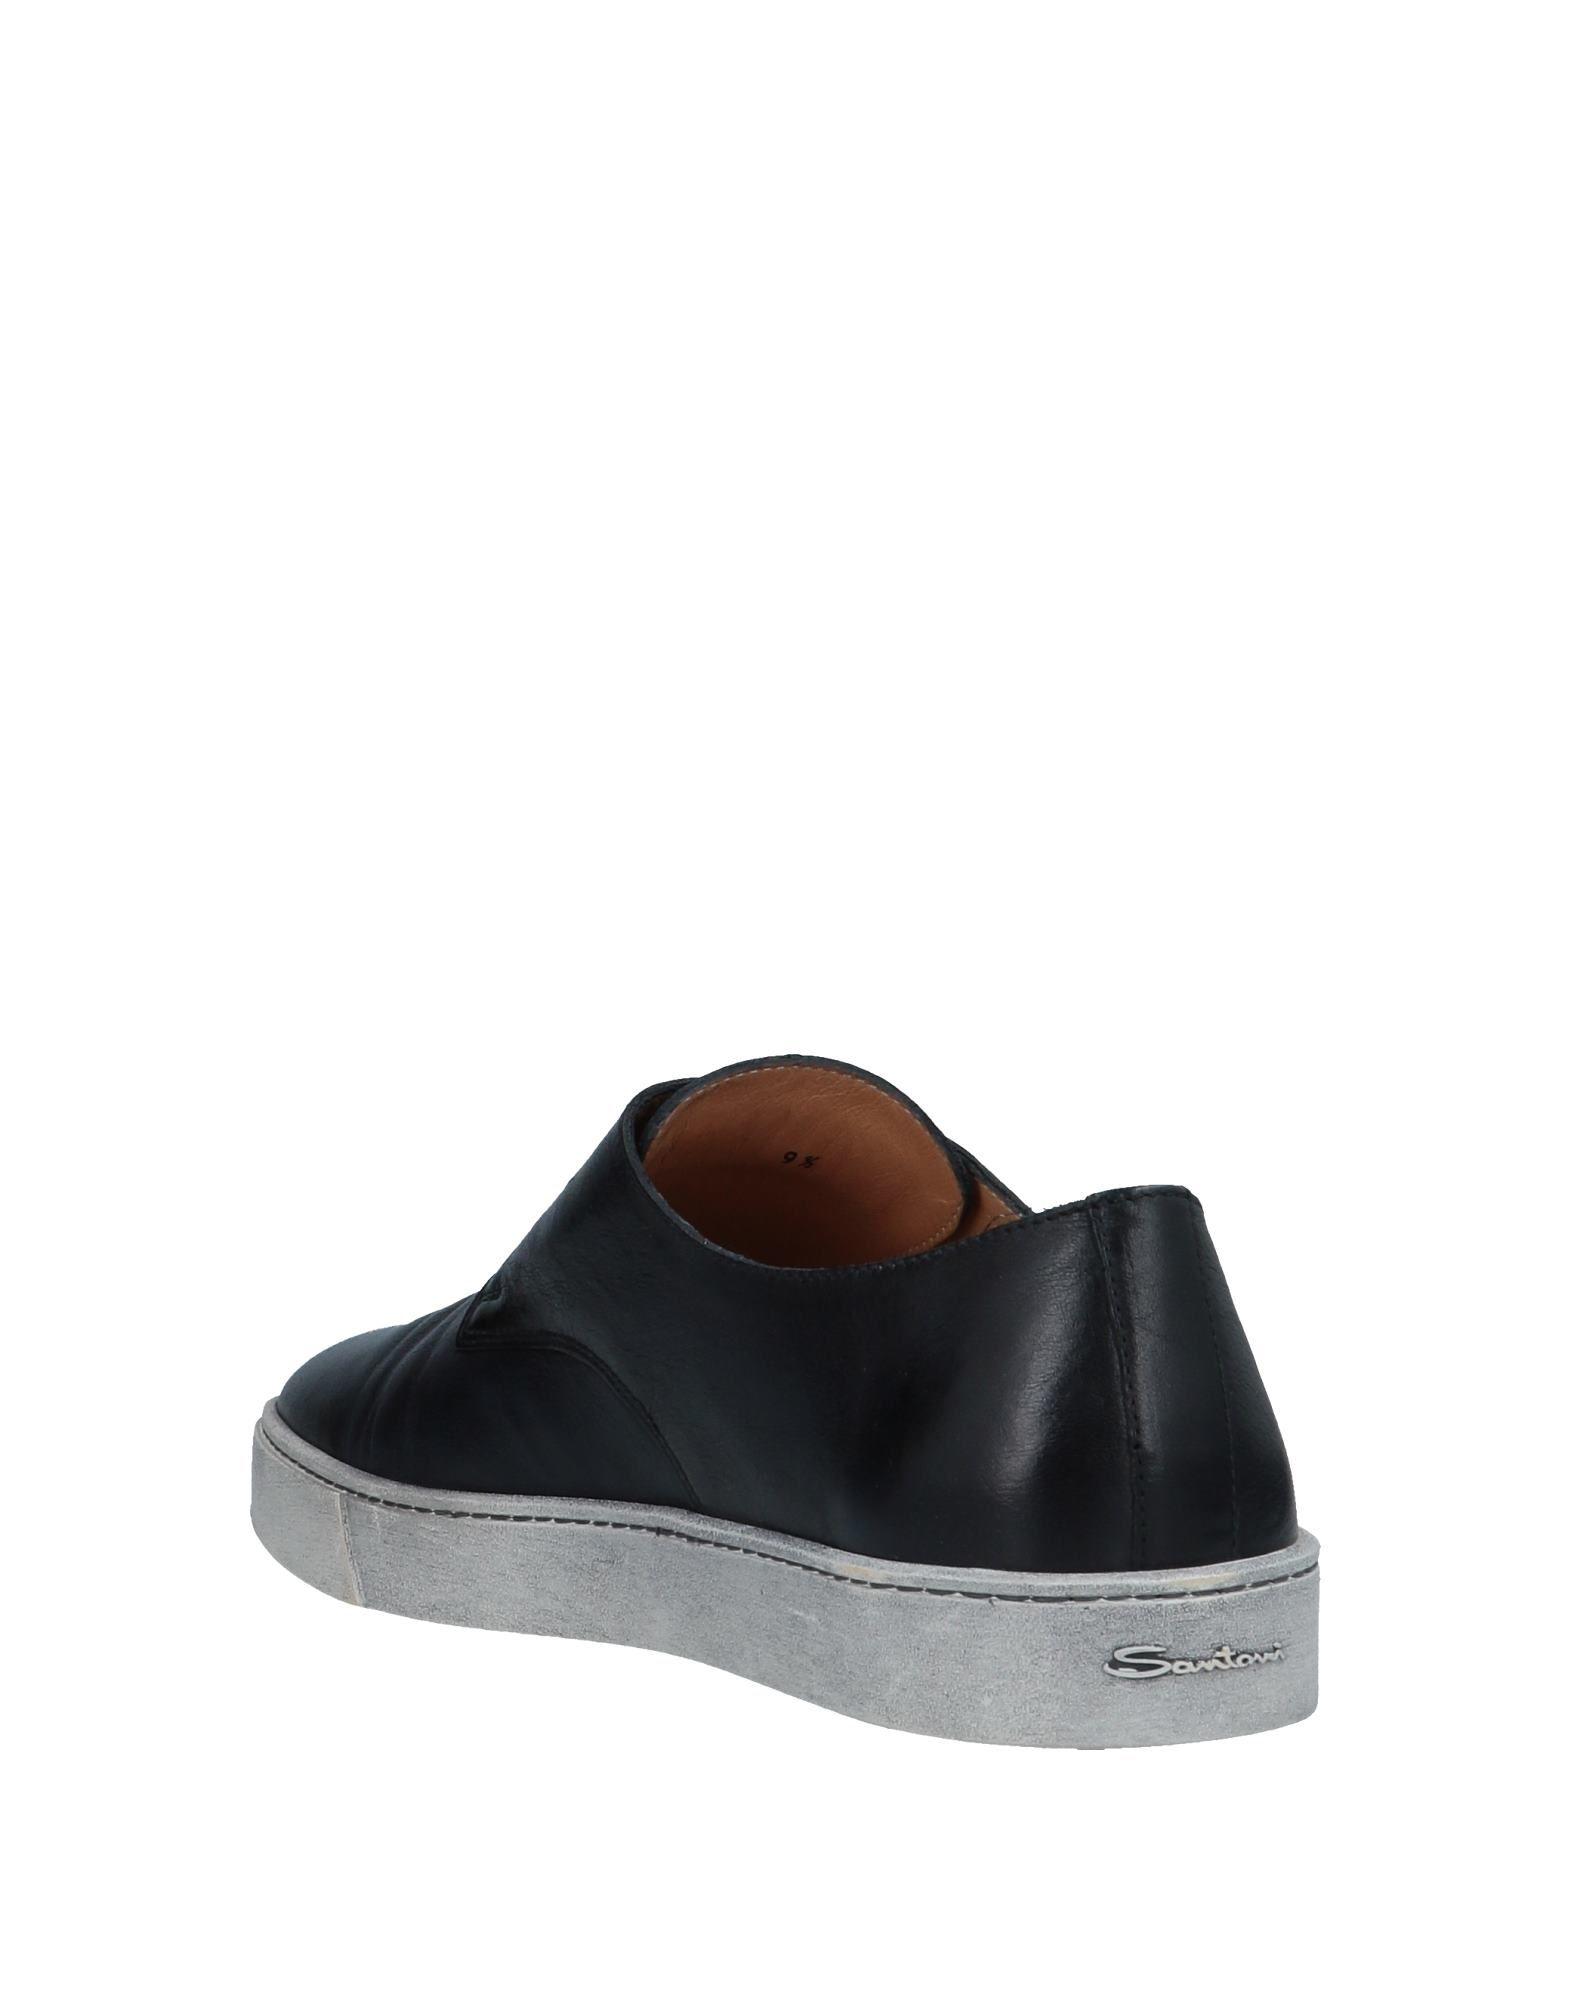 Santoni Mokassins Herren  11541265RD Gute Qualität beliebte Schuhe